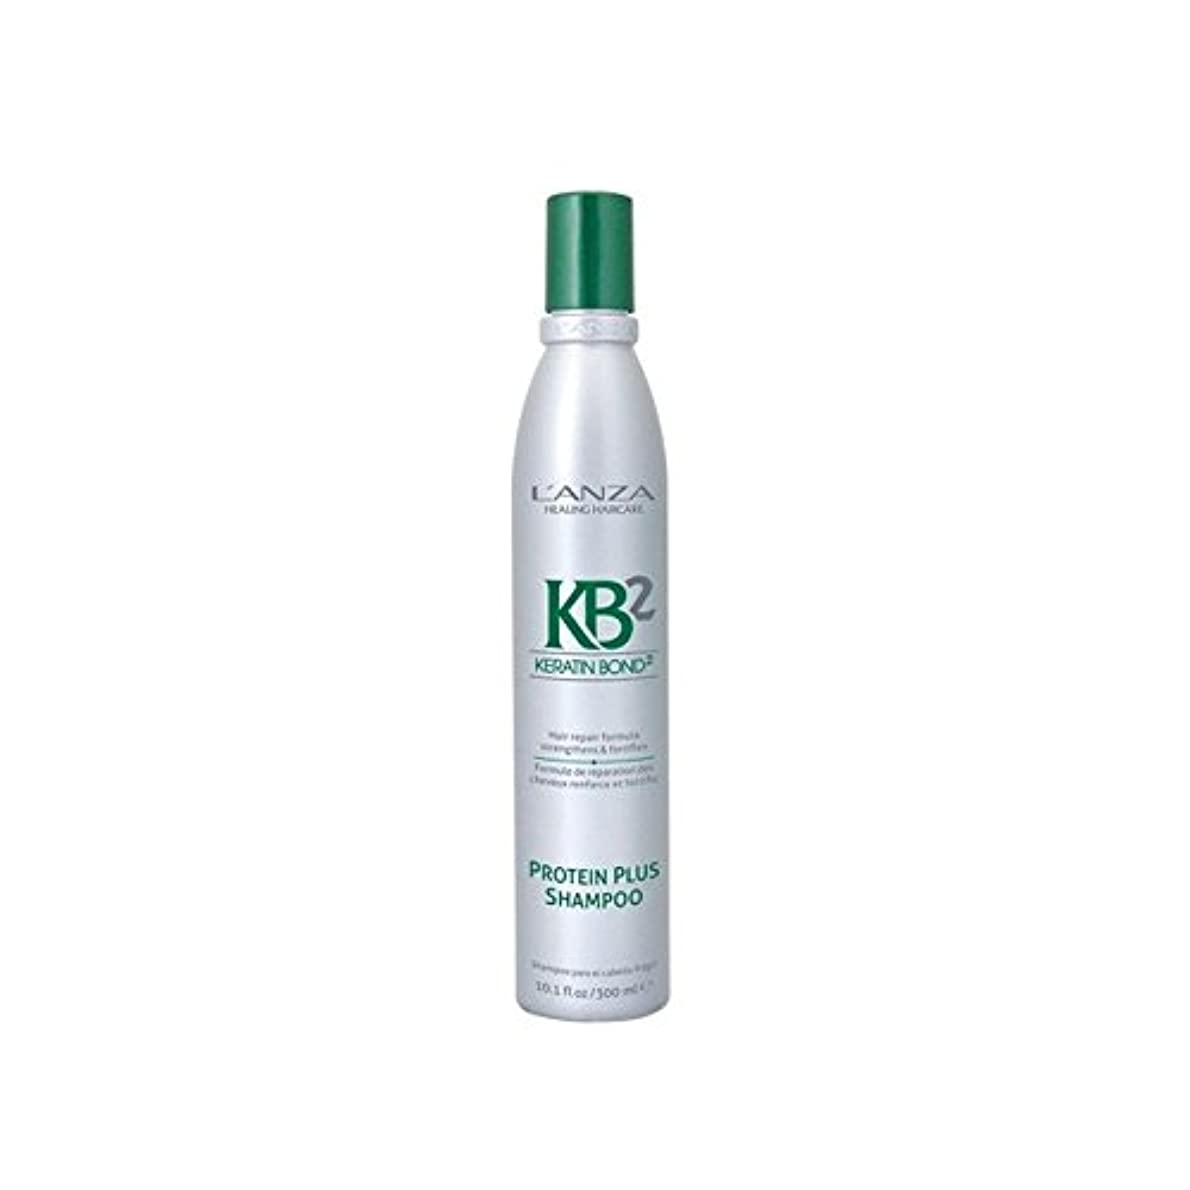 L'Anza Kb2 Protein Plus Shampoo (300ml) (Pack of 6) - アンザ2タンパク質プラスシャンプー(300ミリリットル) x6 [並行輸入品]